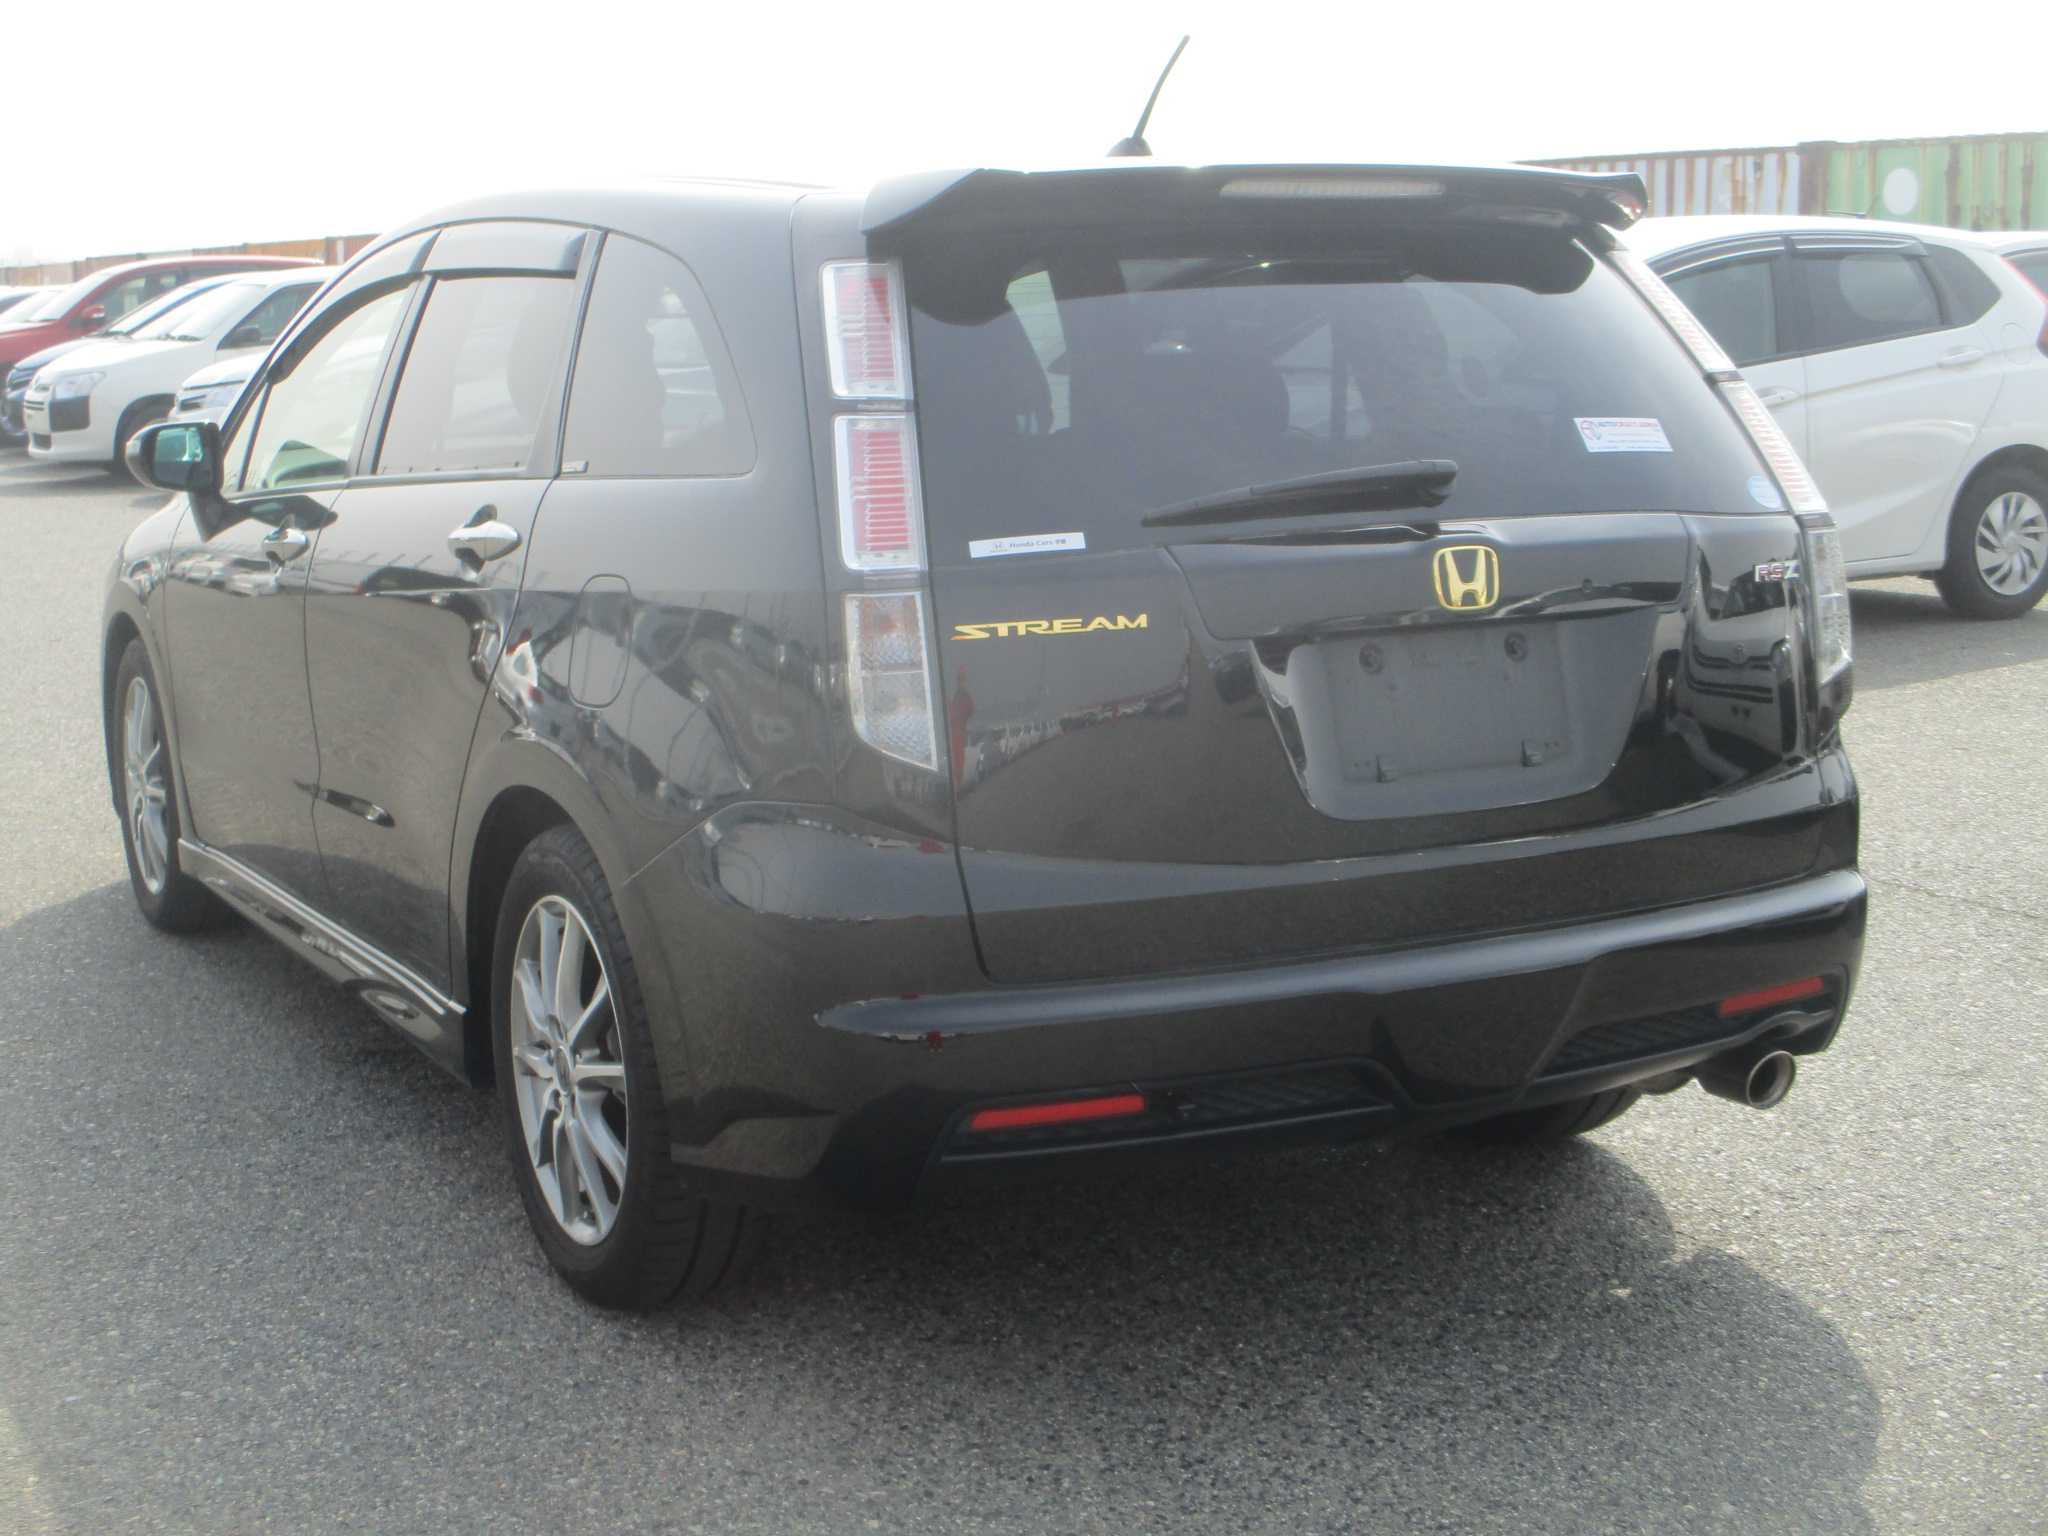 Honda Stream 2013, BLACK, 1800cc - Autocraft Japan